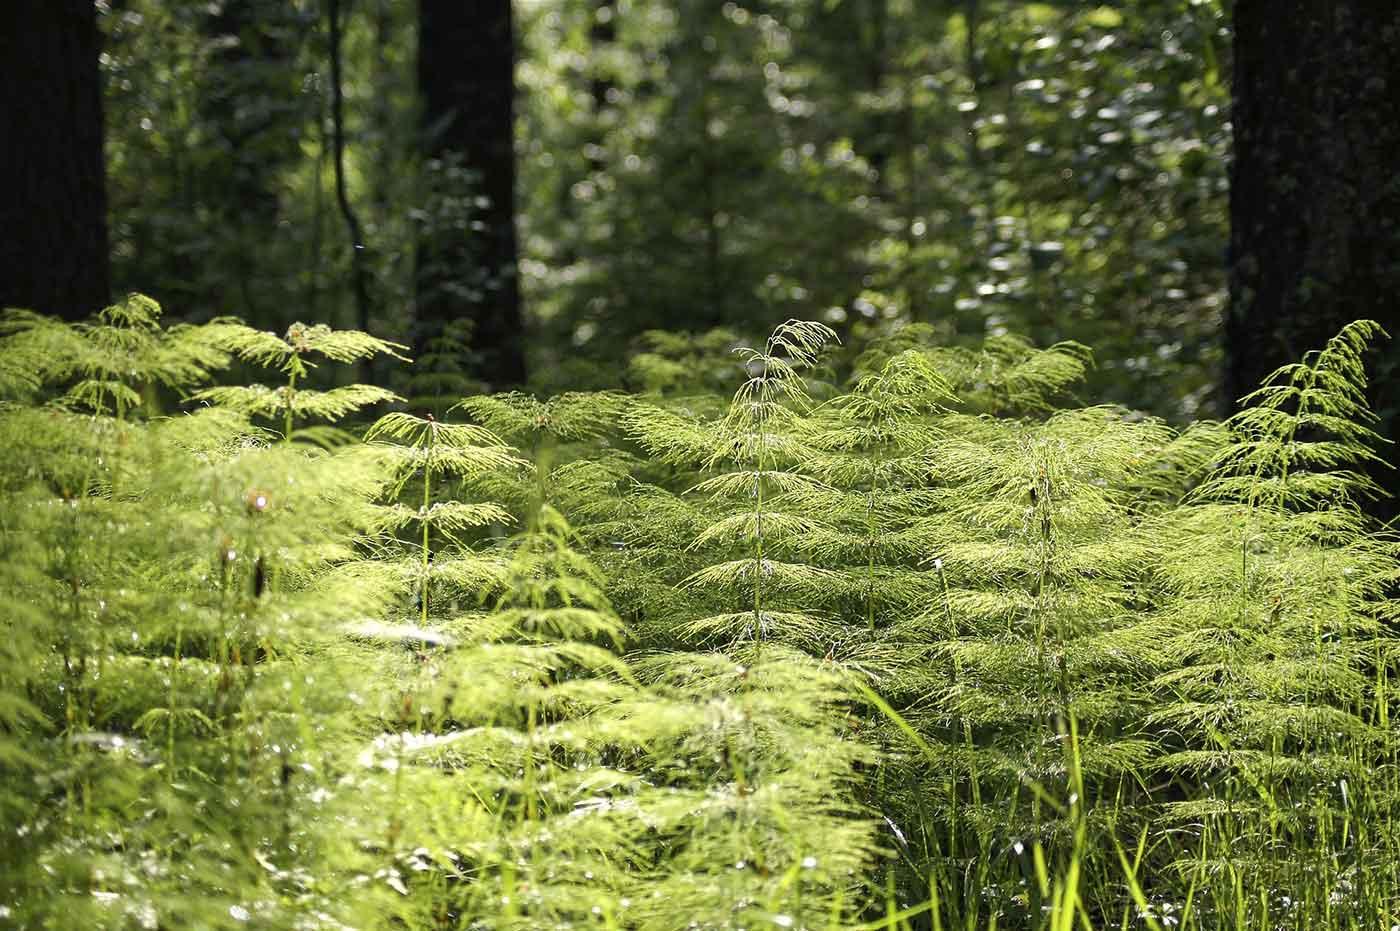 Growing vegetation